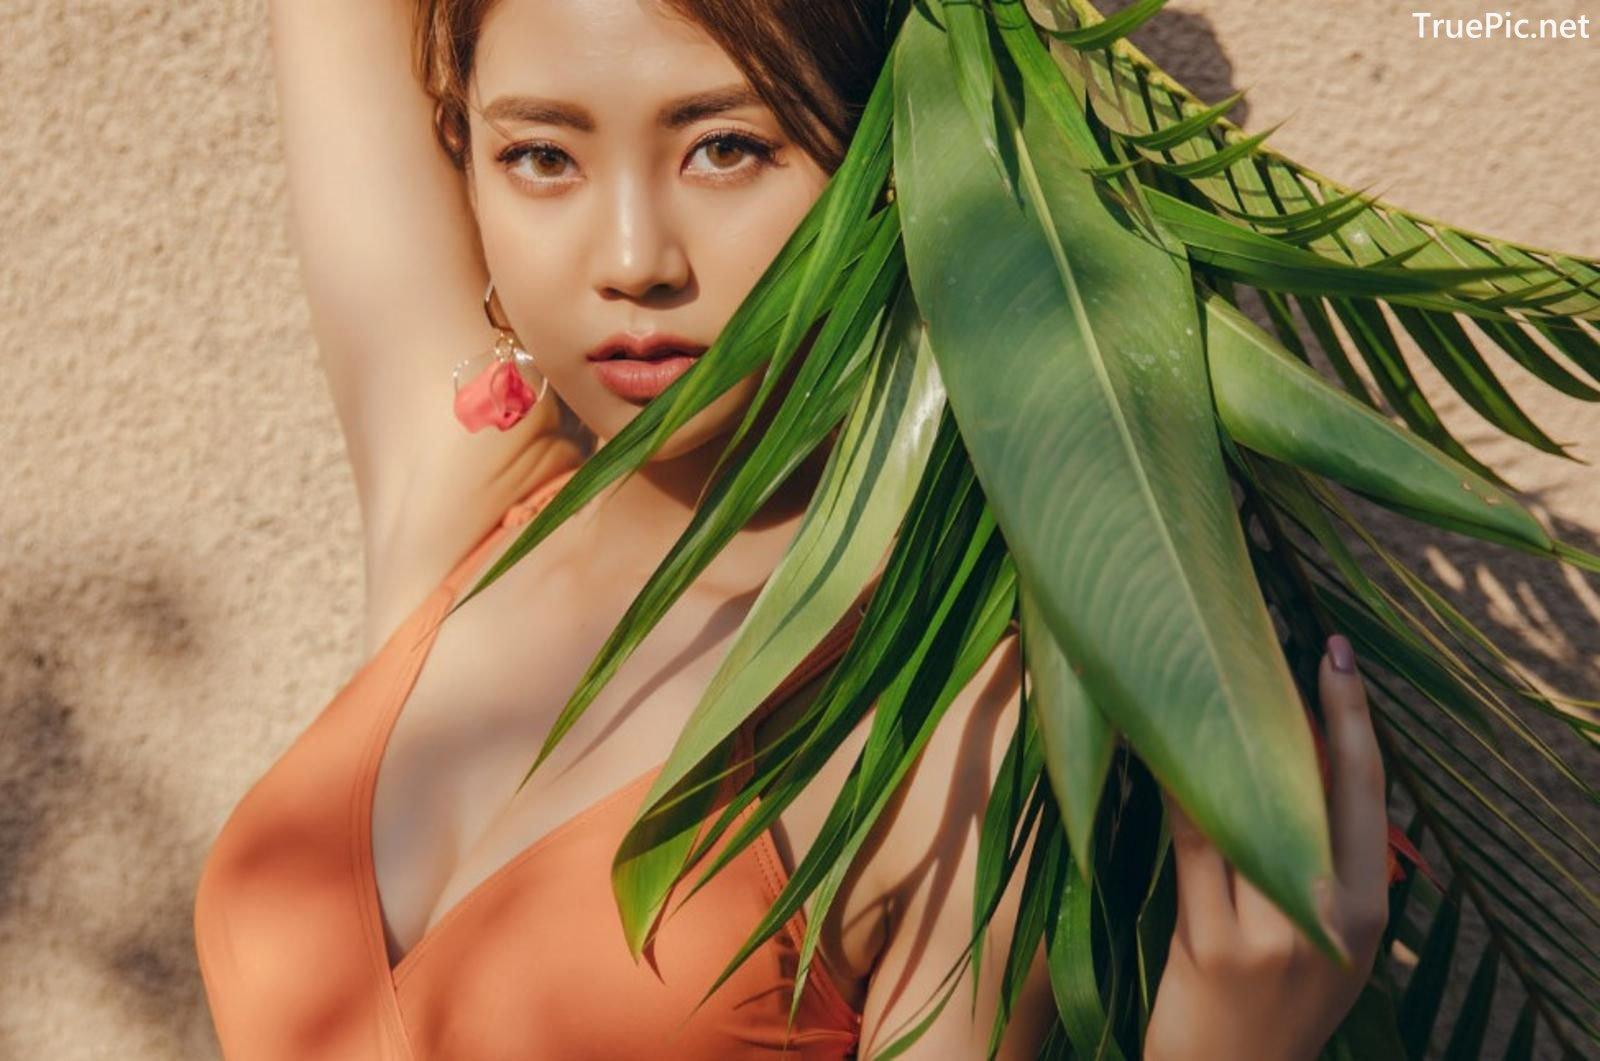 Image Korean Fashion Model - Lee Chae Eun - Sienna One Piece Swimsuit - TruePic.net - Picture-21